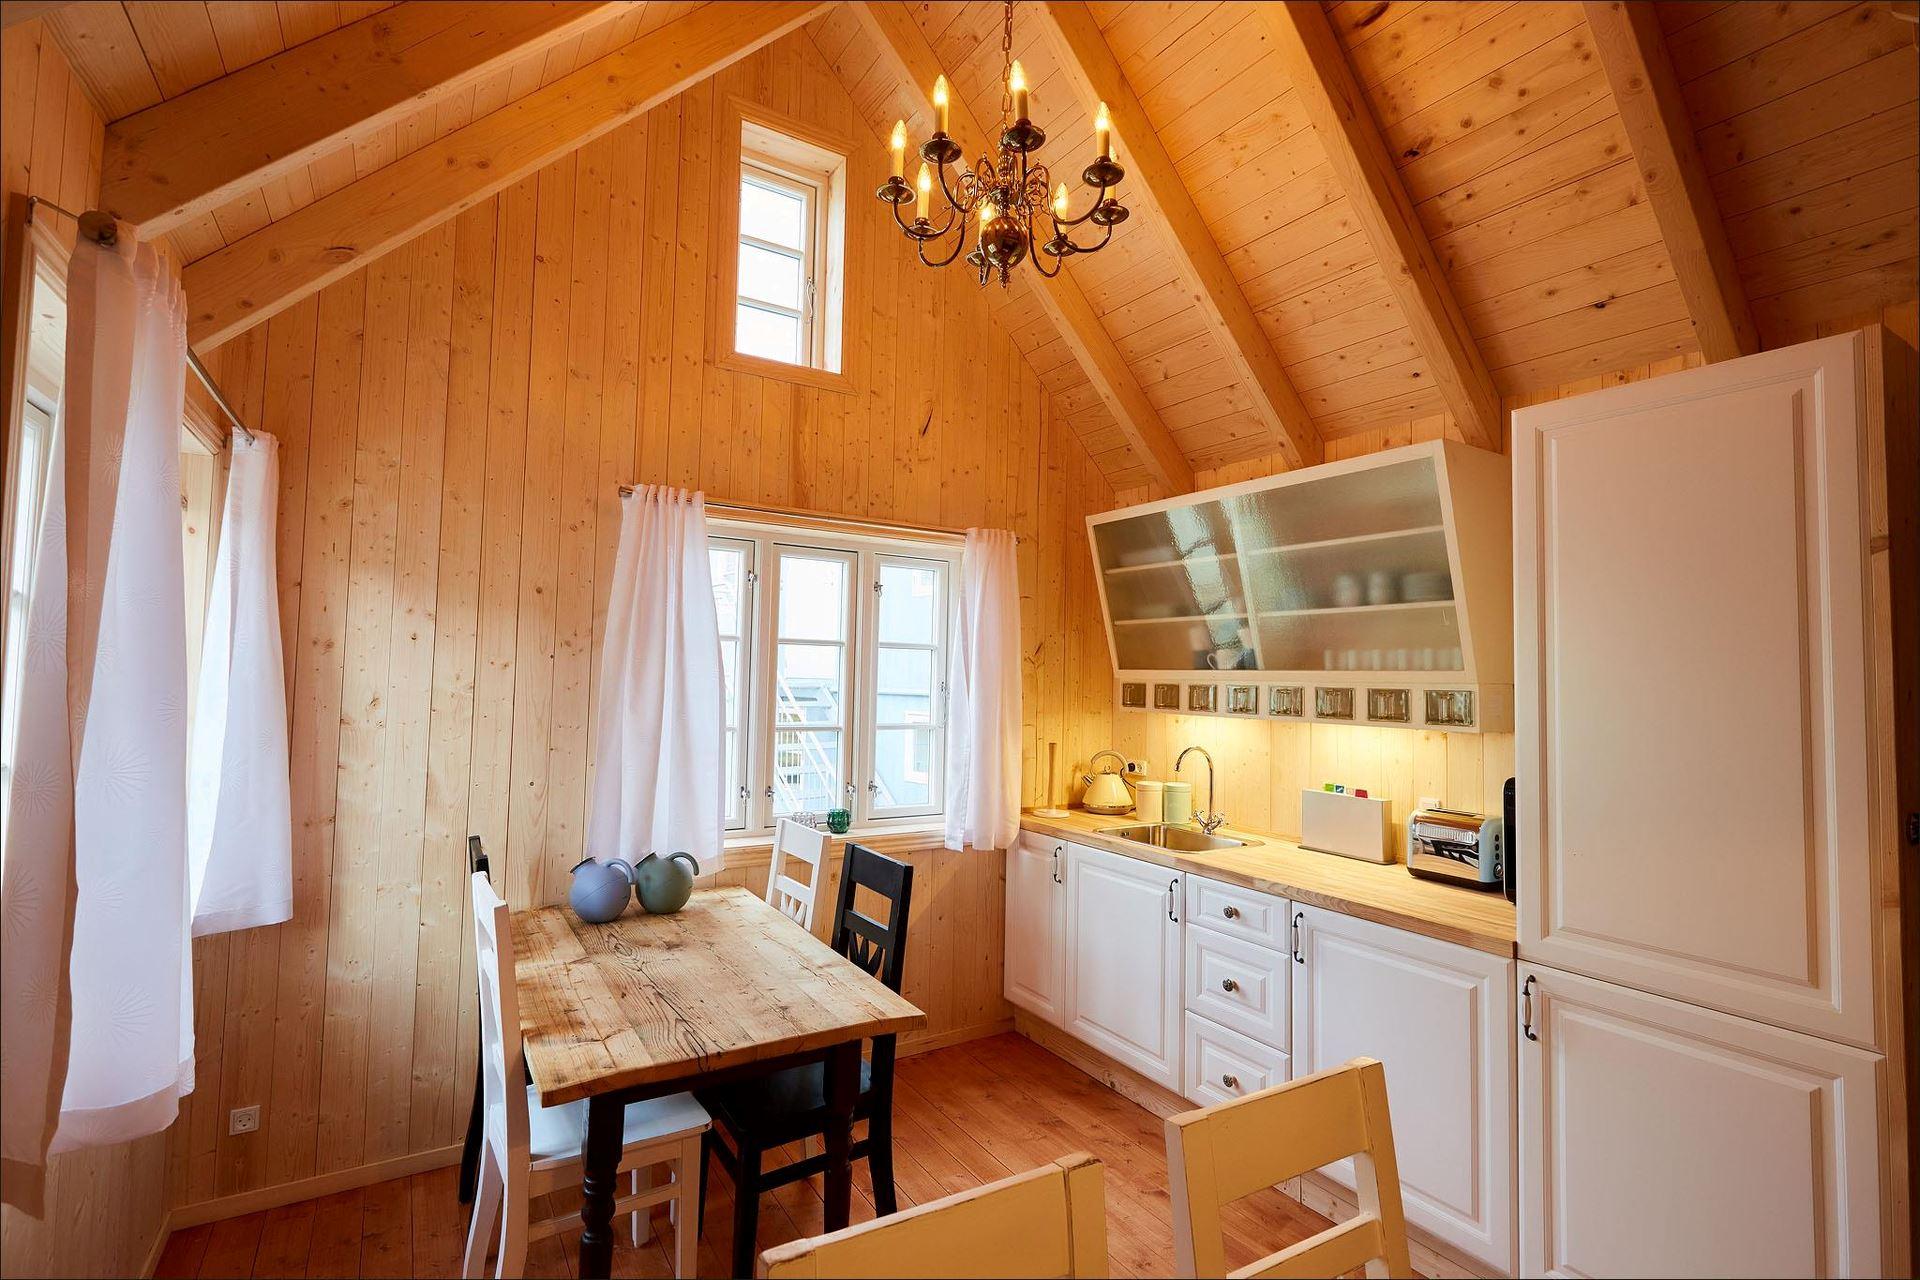 New wooden cottage at the Hotel Hafnia ©Hotel Hafnia